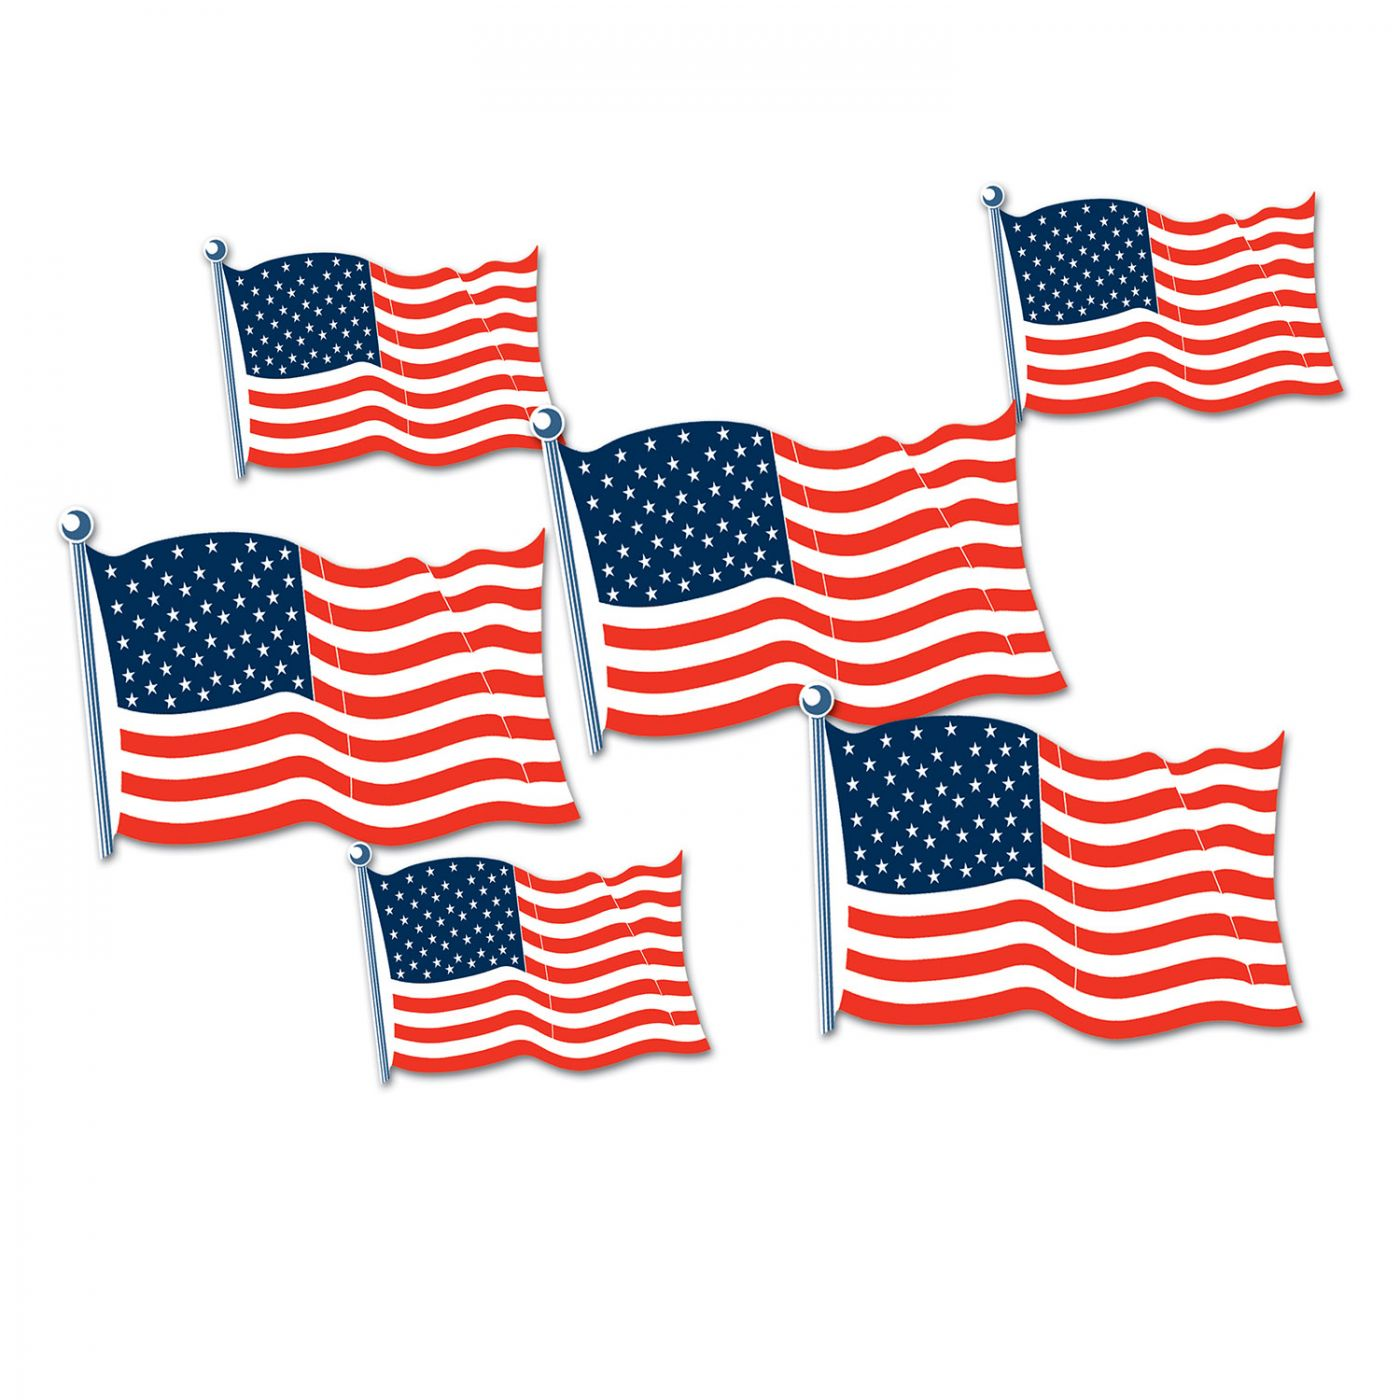 Image of American Flag Cutouts